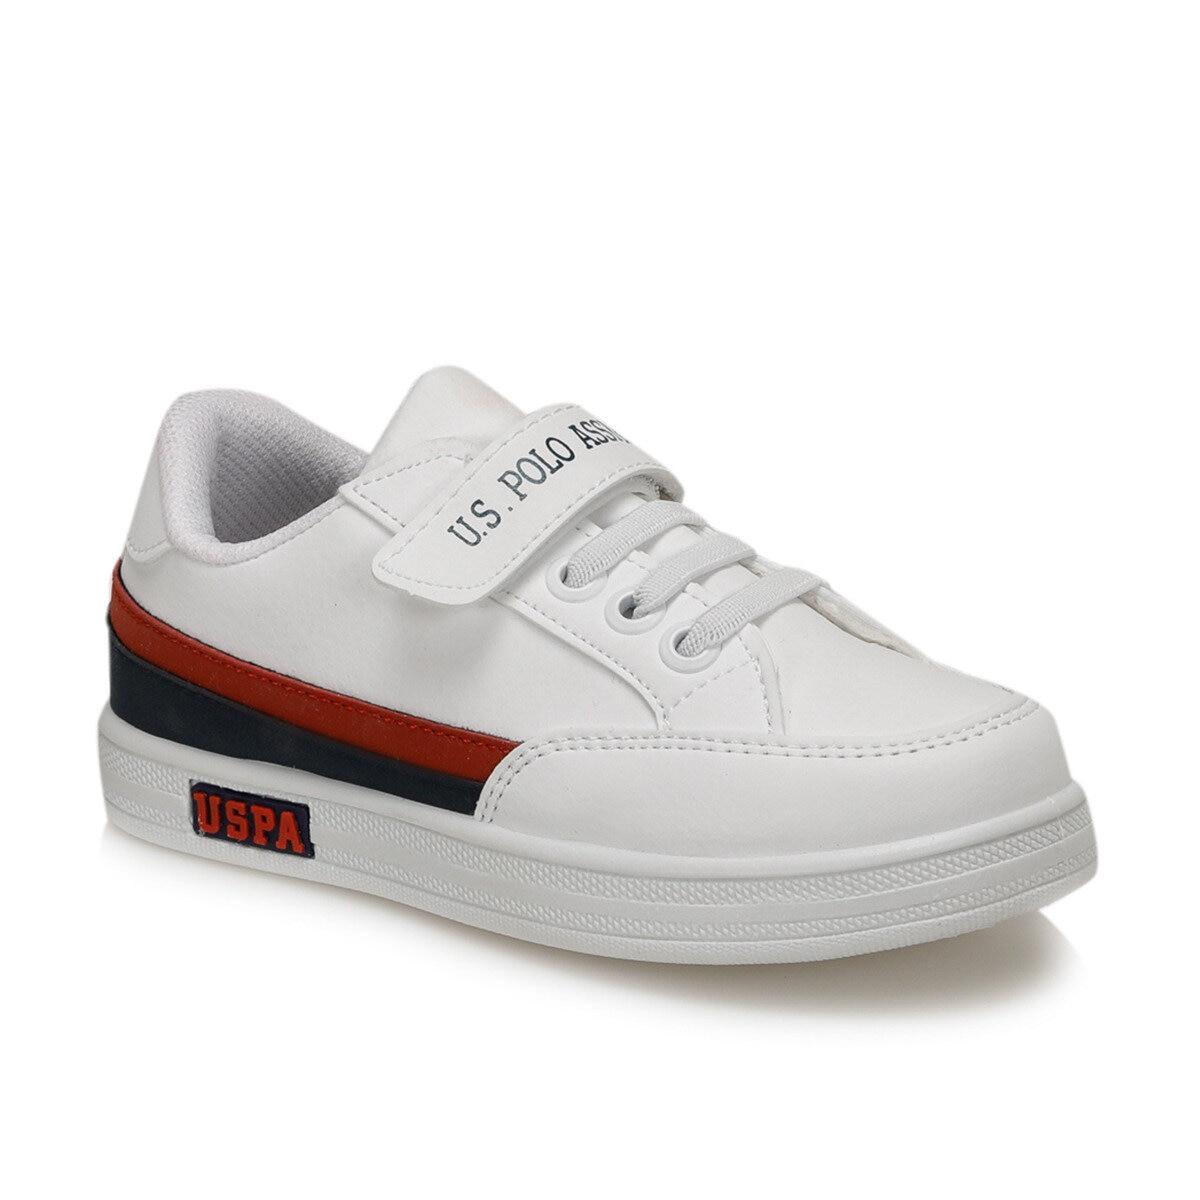 FLO JAMAL 9PR White Male Child Sneaker Shoes U.S. POLO ASSN.